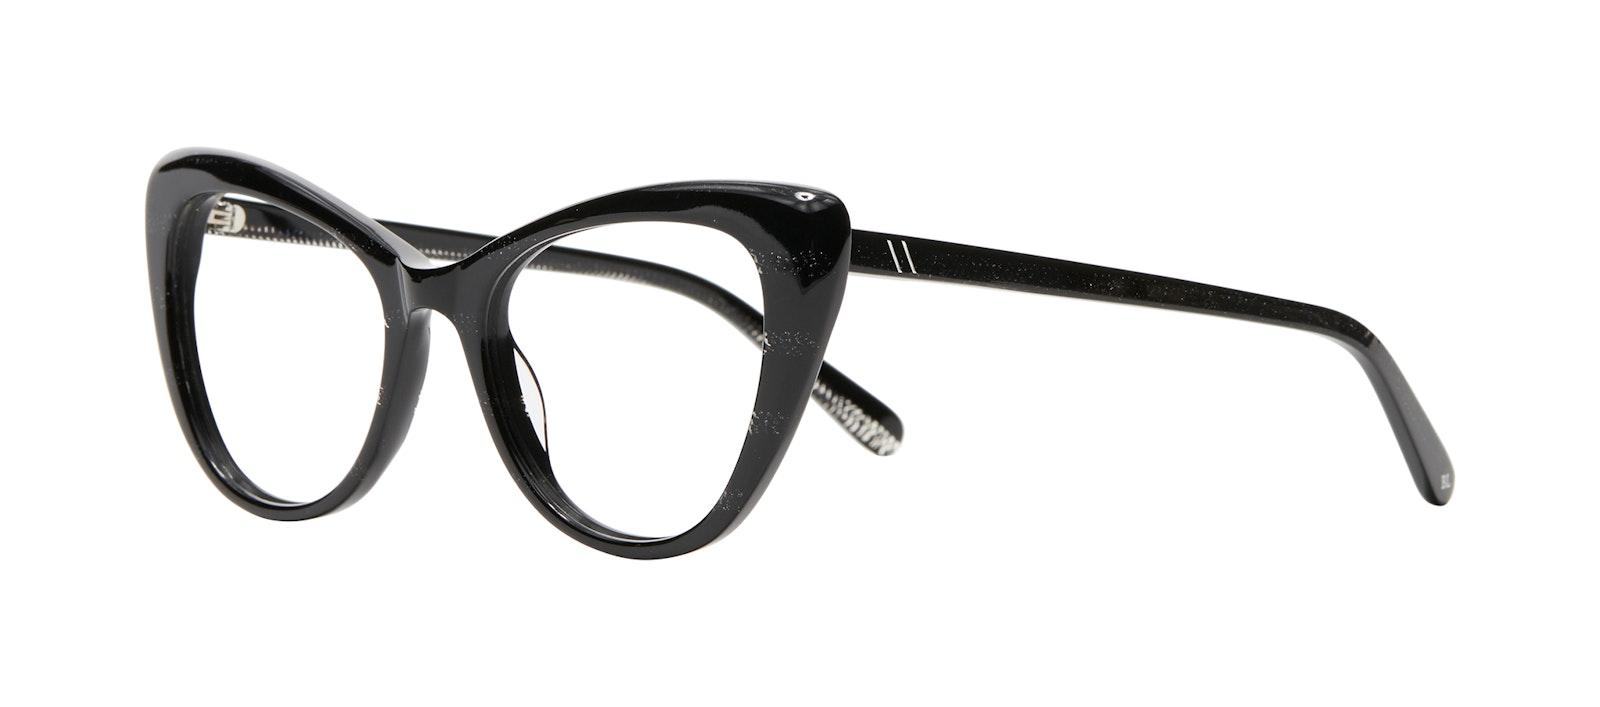 Affordable Fashion Glasses Cat Eye Eyeglasses Women Verve M Night Tilt